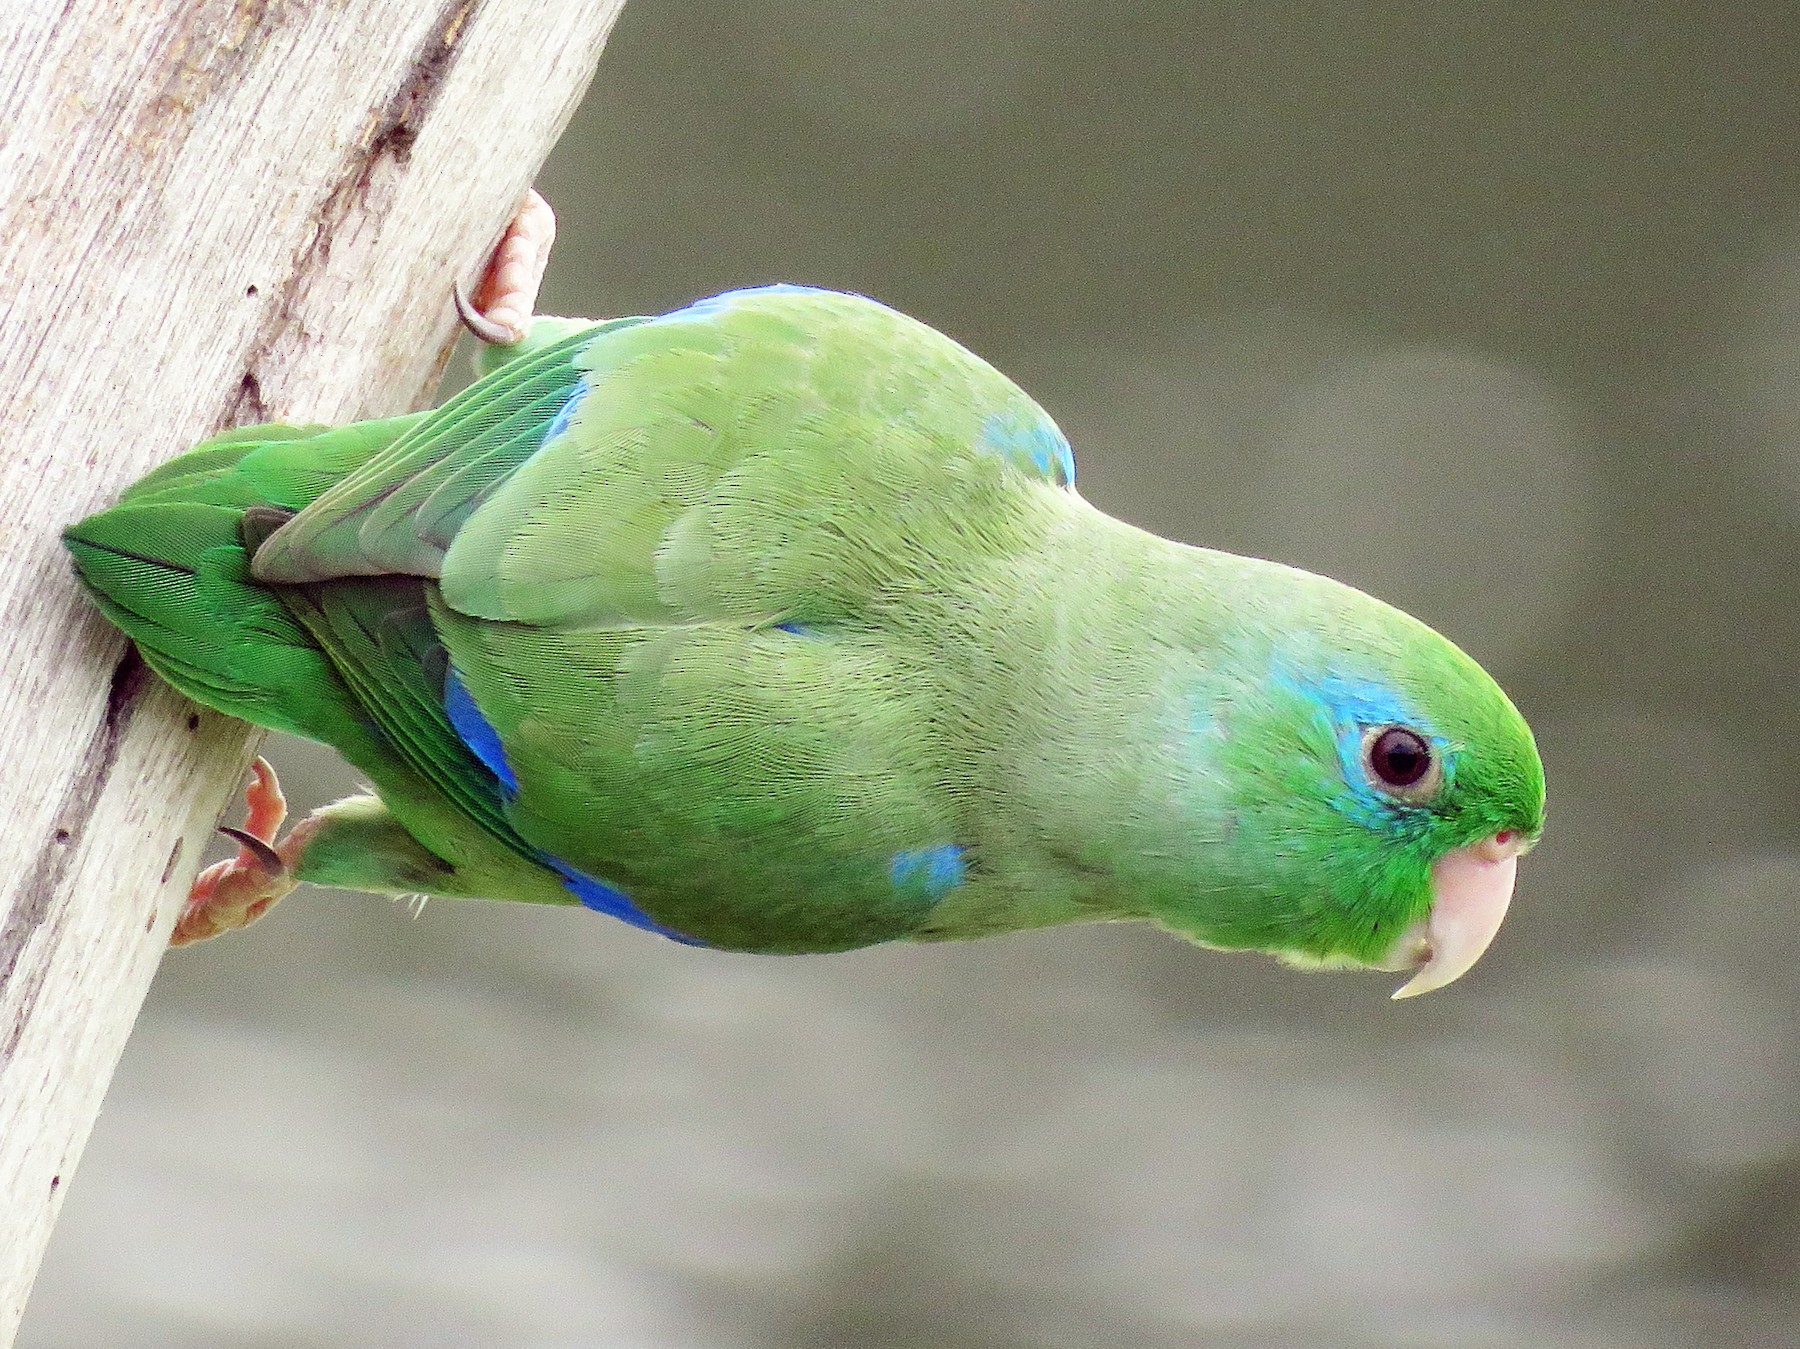 Spectacled Parrotlet - Juan Pablo Arboleda